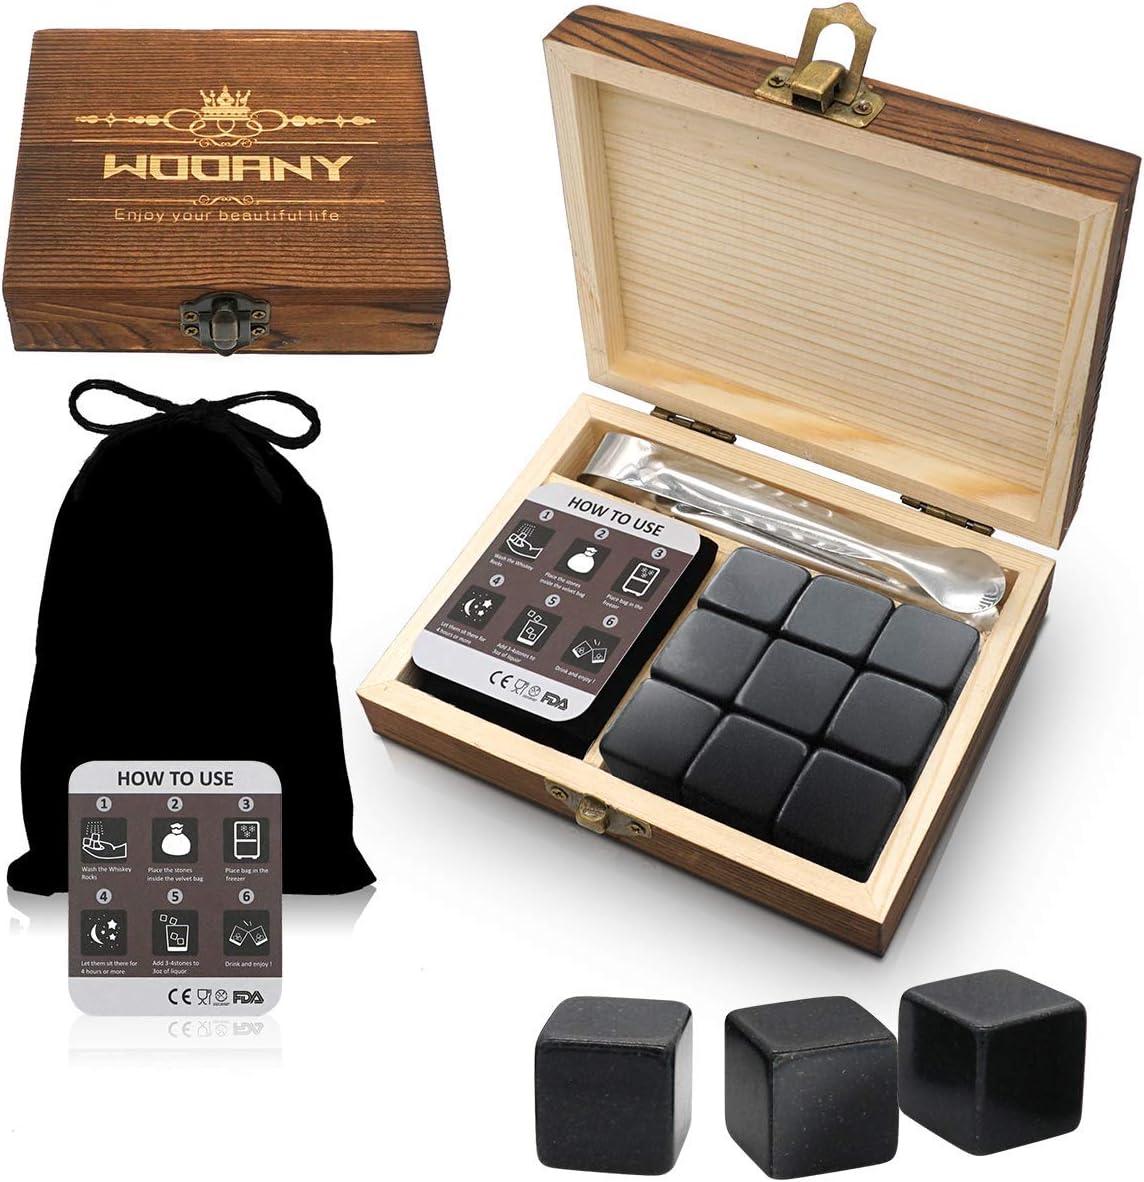 Whiskey Stones Gift Box Set 9PC Whiskey Stones in Luxury Wooden Gift Box